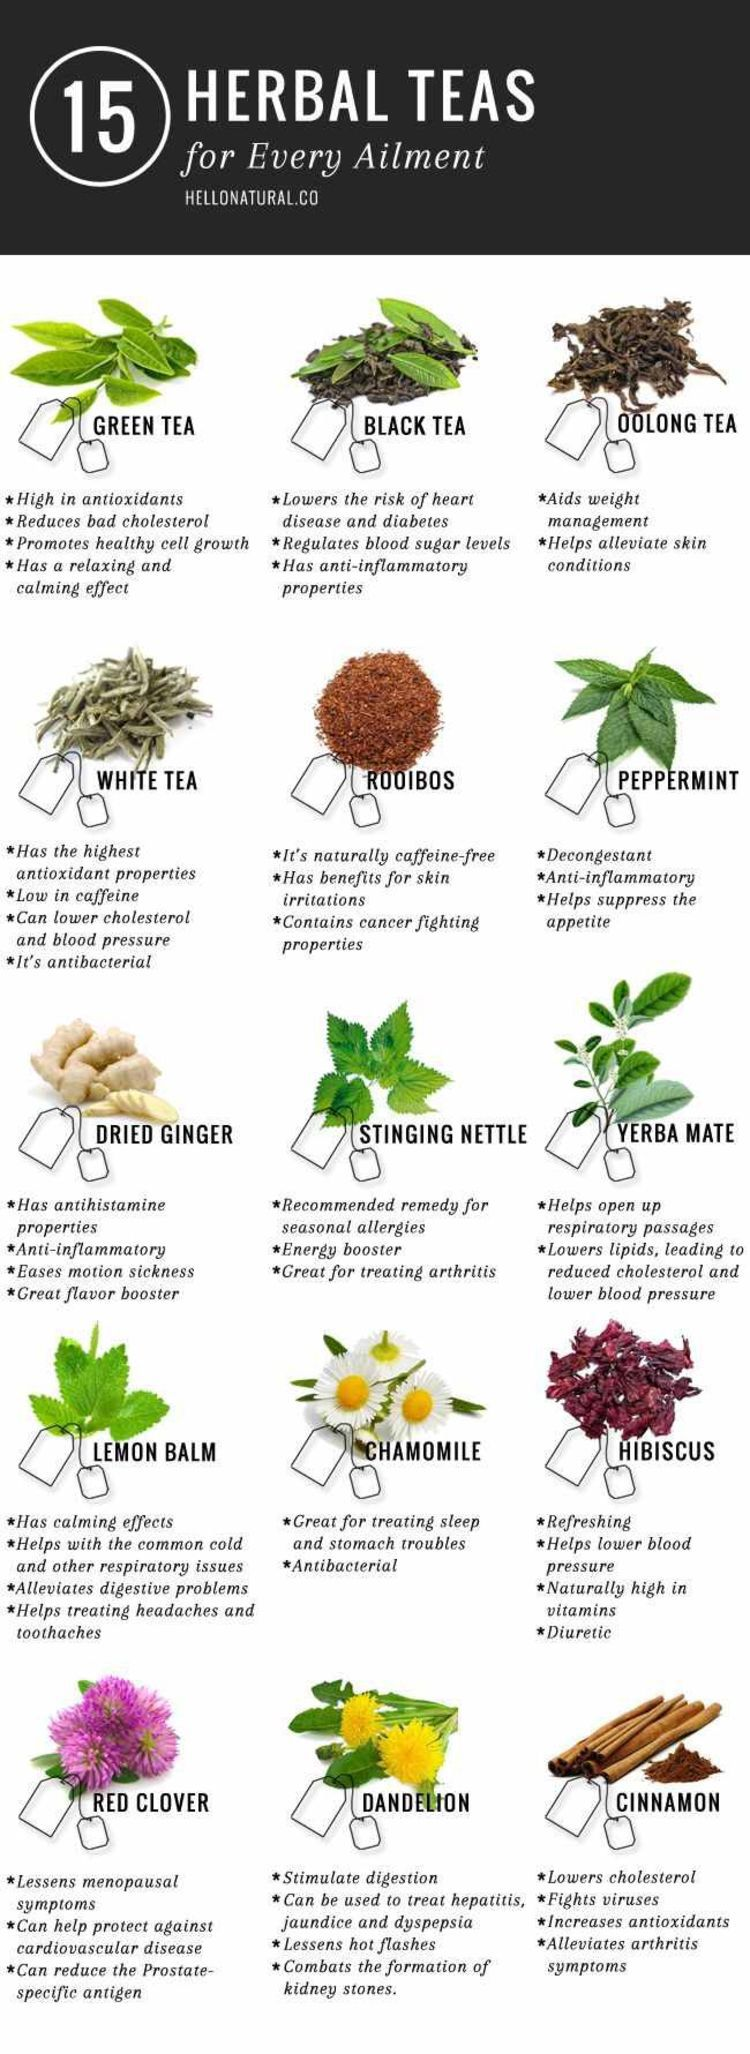 15 Herbal Teas For Every Ailment